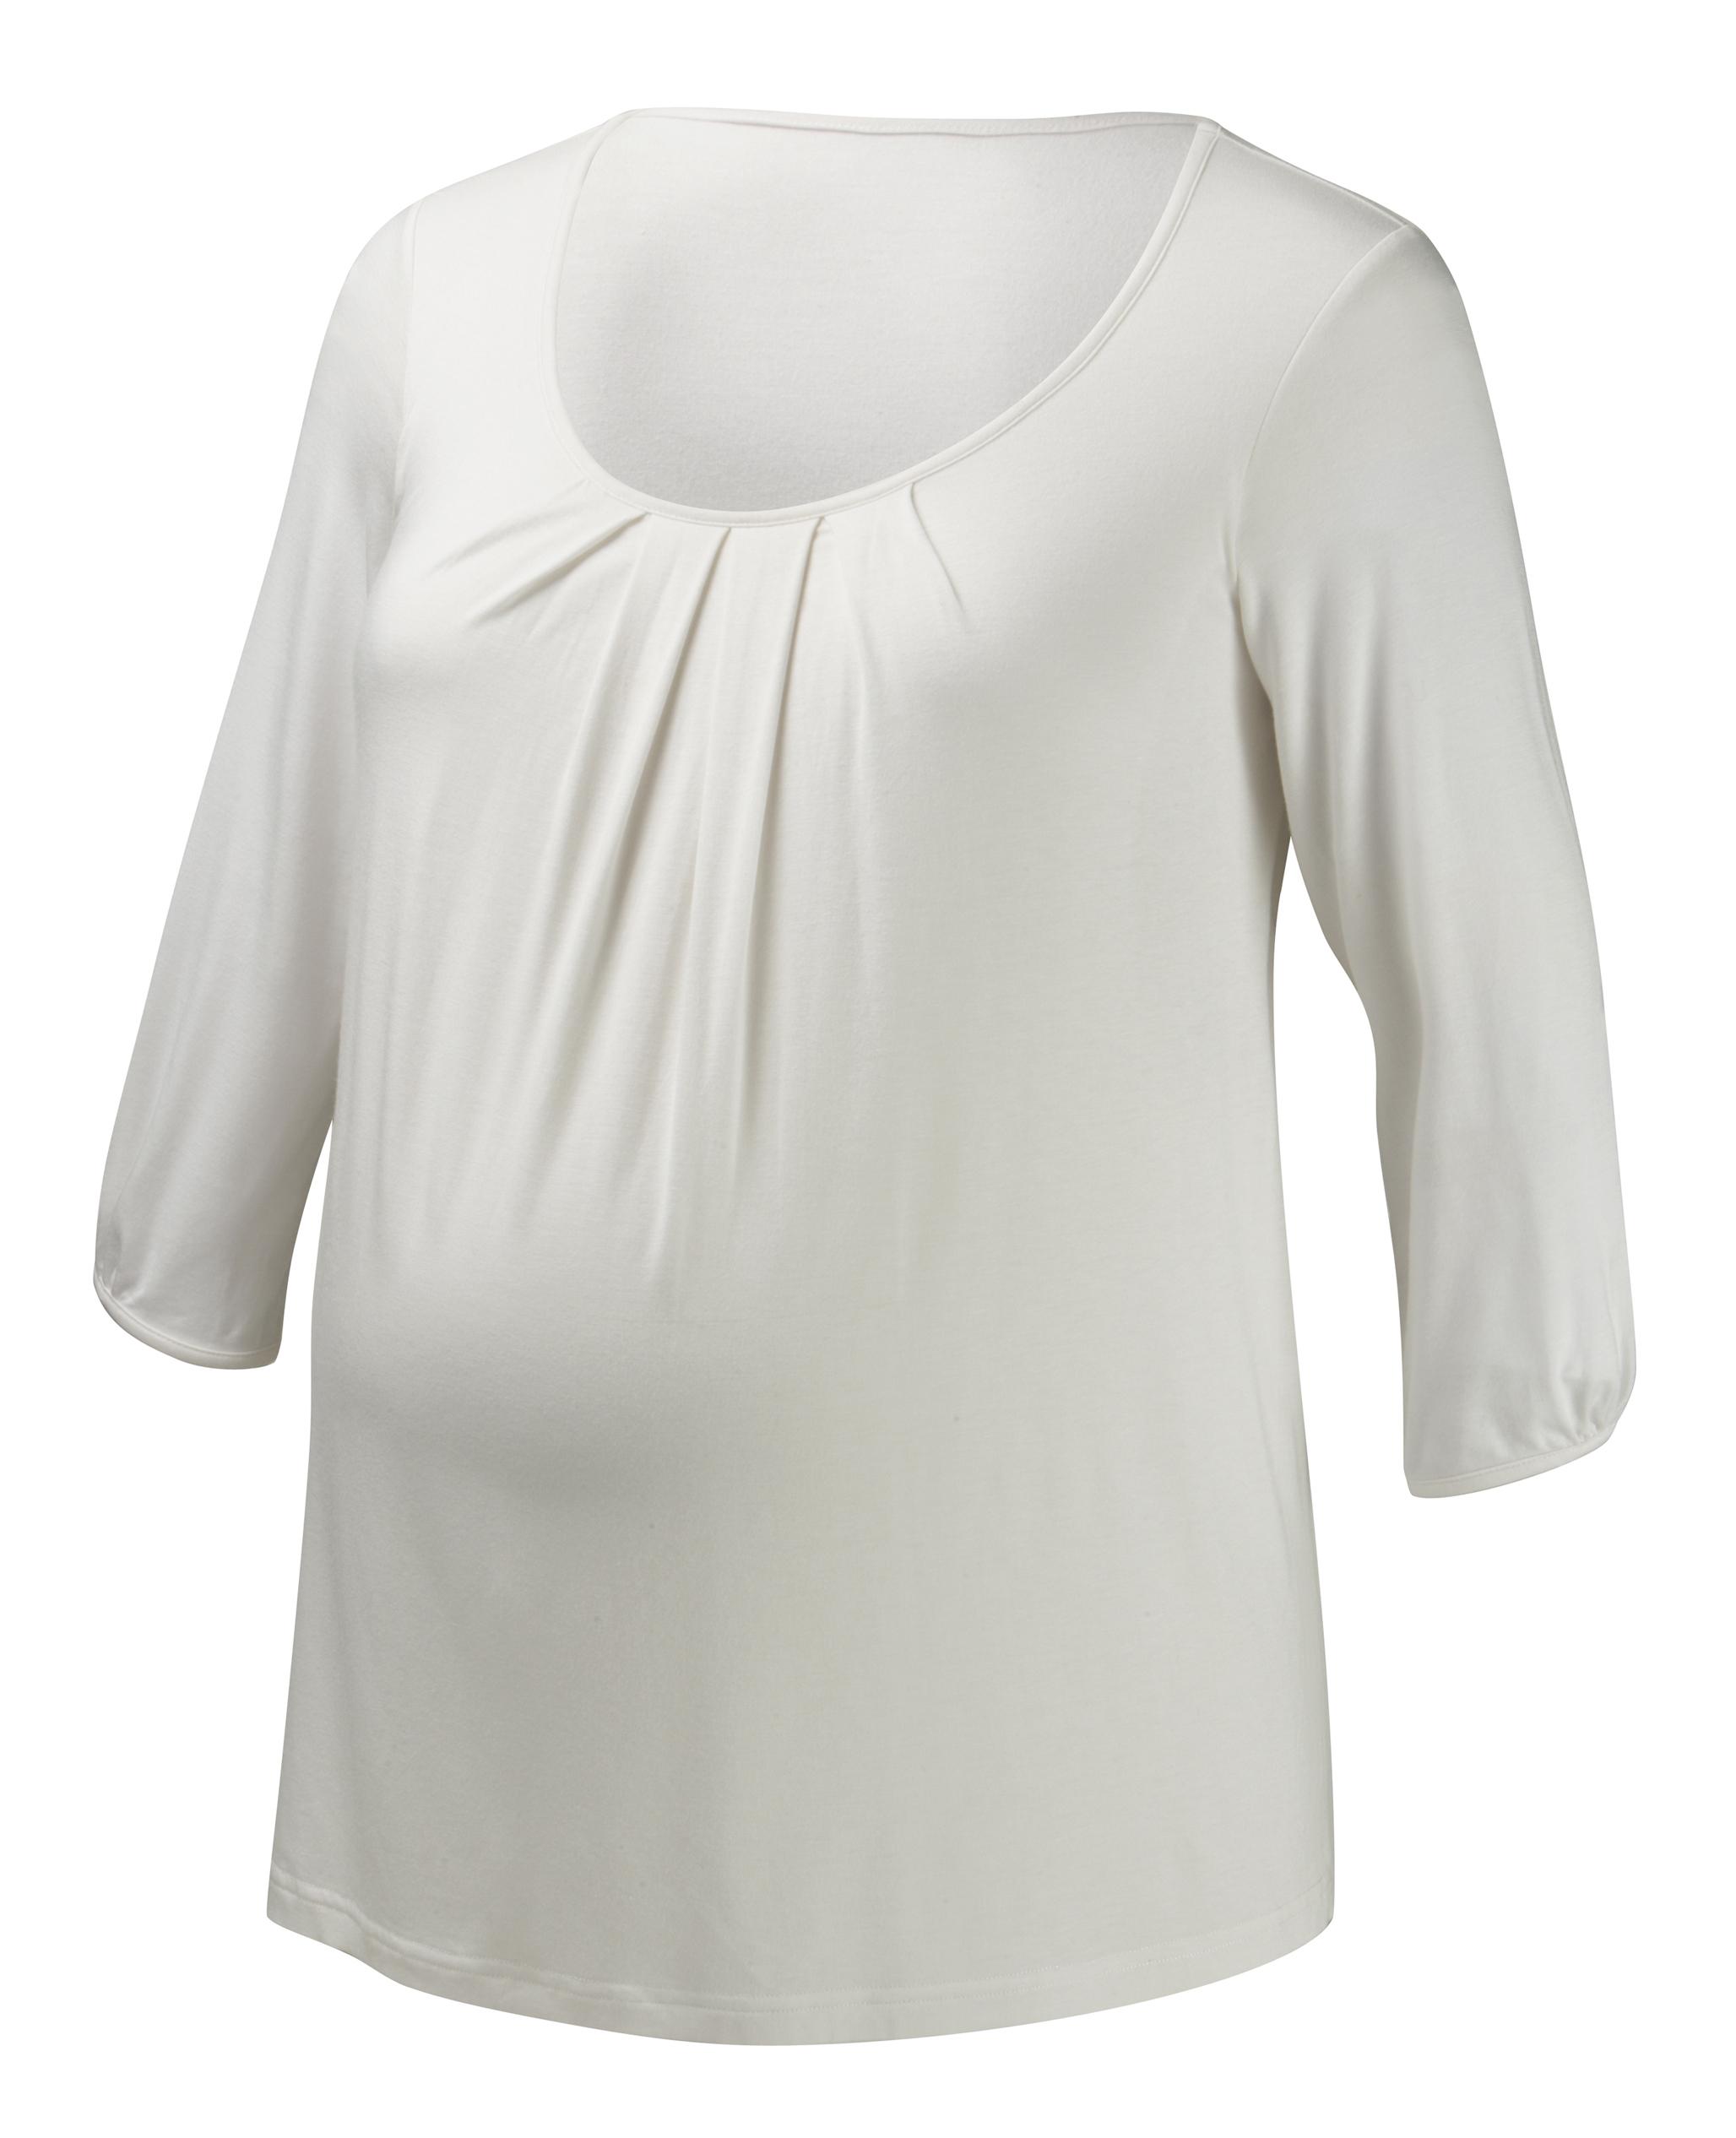 012-JT25-03 | cloud 9 ¾ sleeve nursing top | ivory